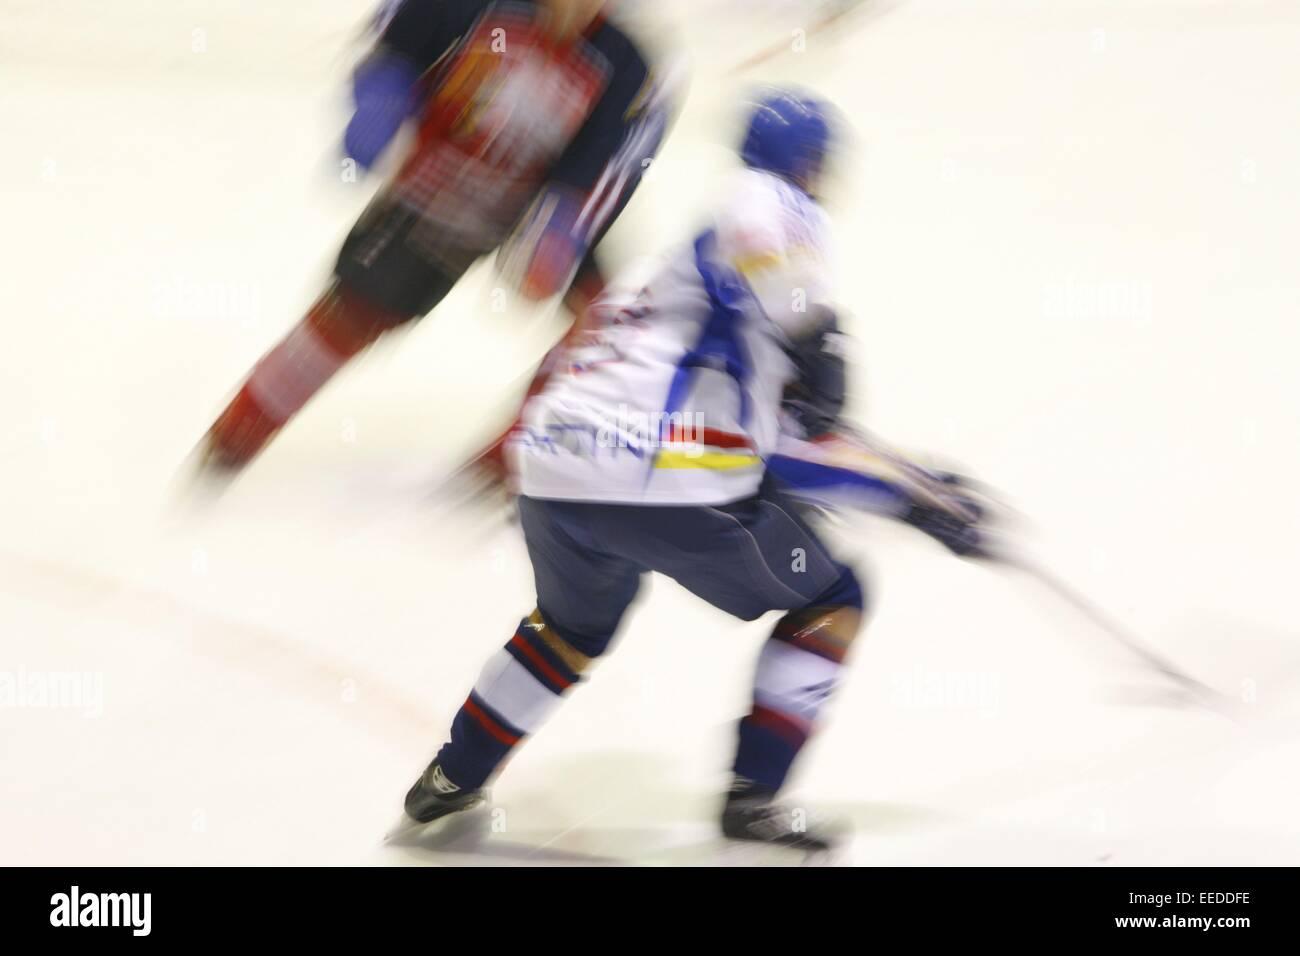 Eishockey, Spielszene, Eishockeyspiel, Spieler, Spiel, Mannschaftspiel, Sport, Mannschaftssport, sportlich, Hobby, - Stock Image